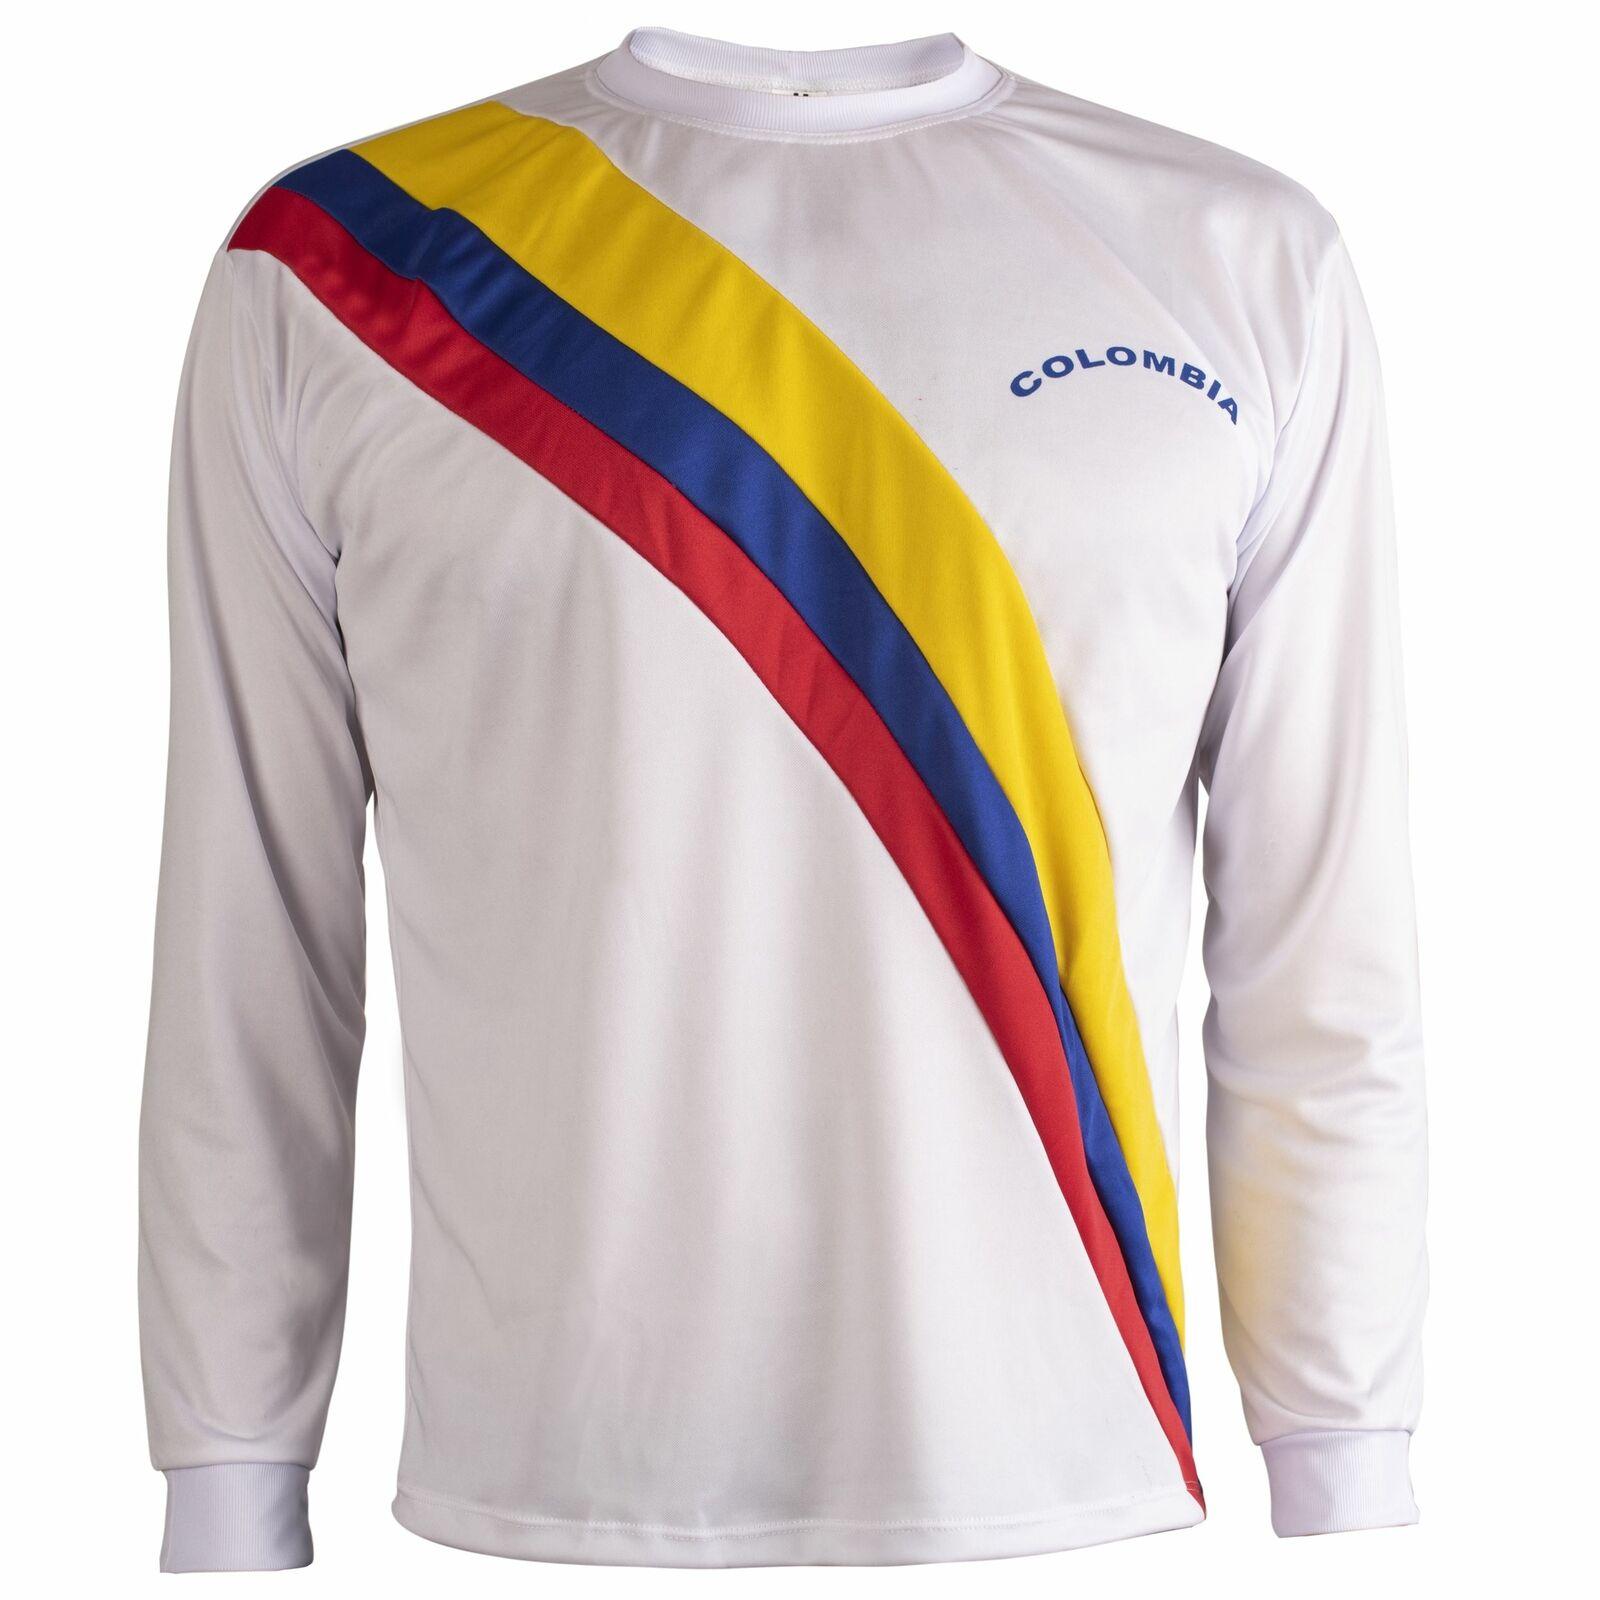 Colombia 1983 Shirt Retro Football Long Sleeve Mens Top